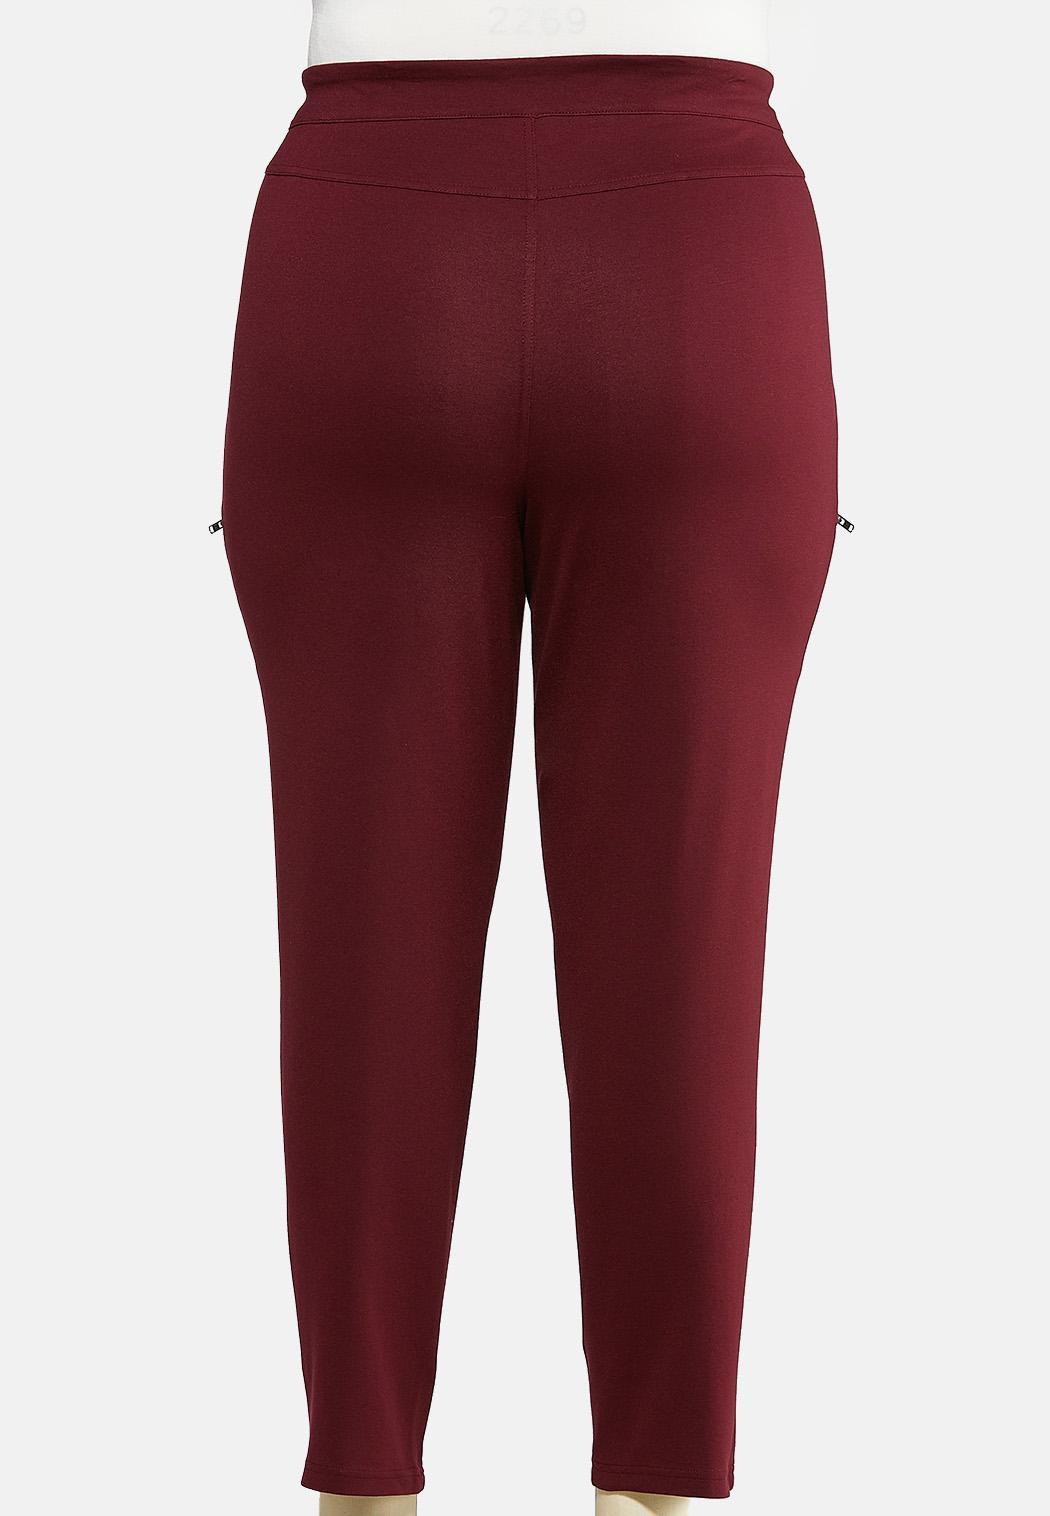 Plus Size Slim Utility Ponte Pants (Item #43976842)